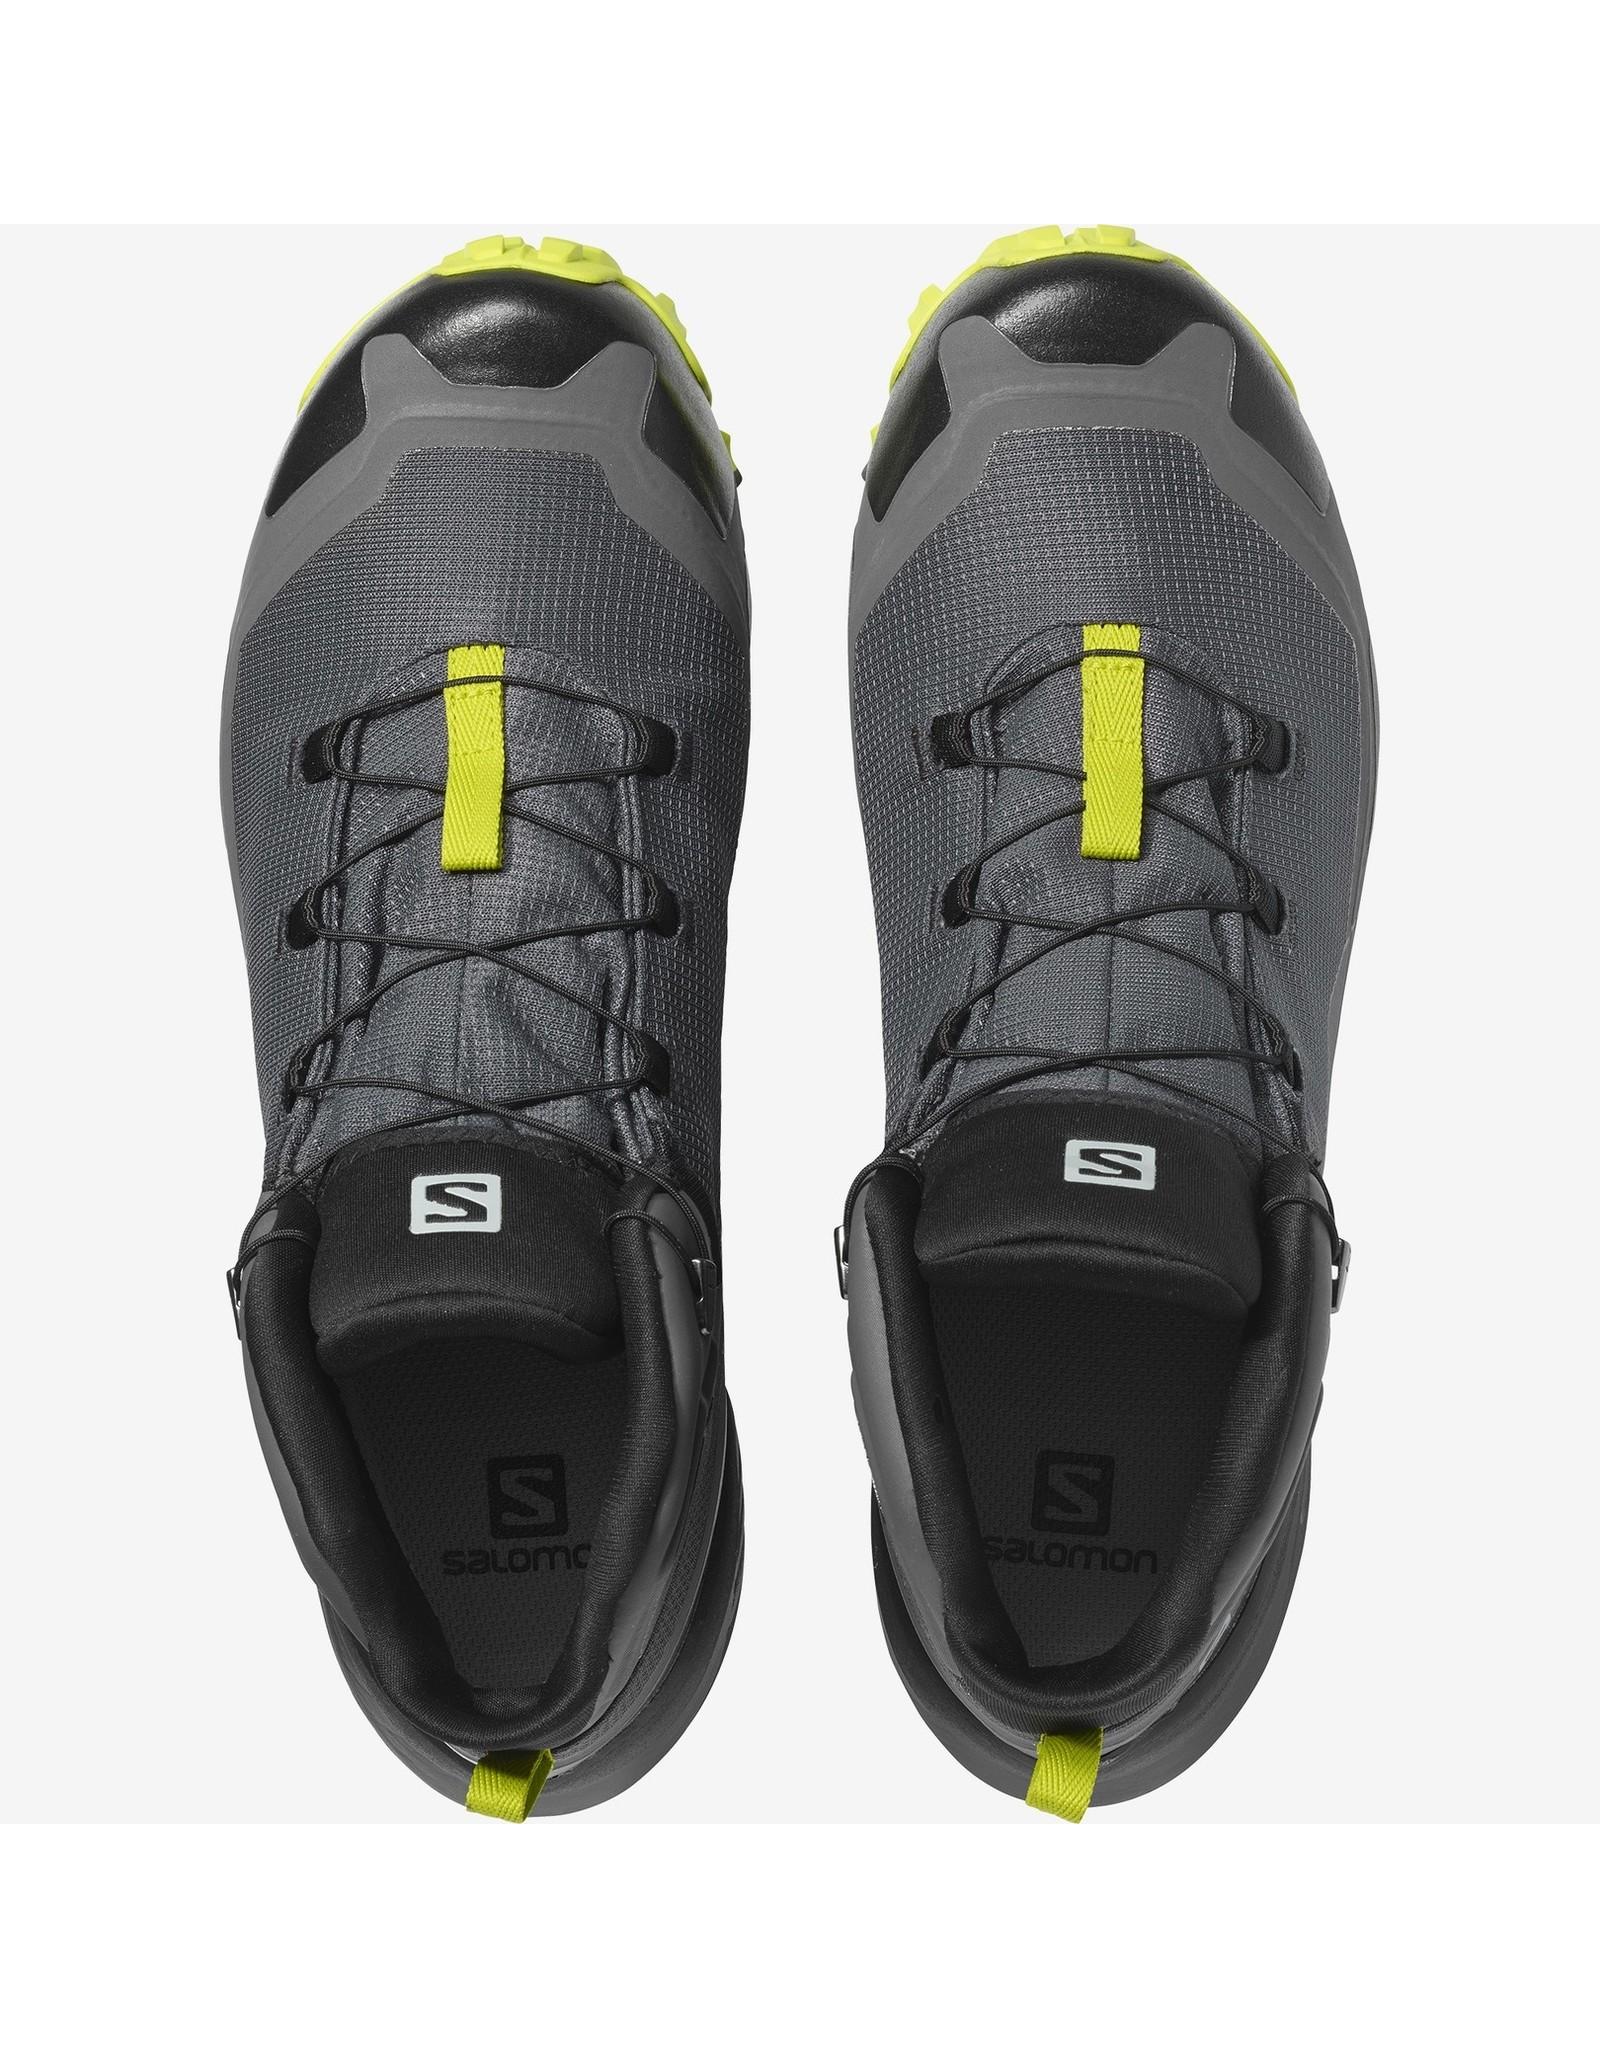 Salomon Salomon Cross Hike Mid Gore-Tex Men's Hiking Boots